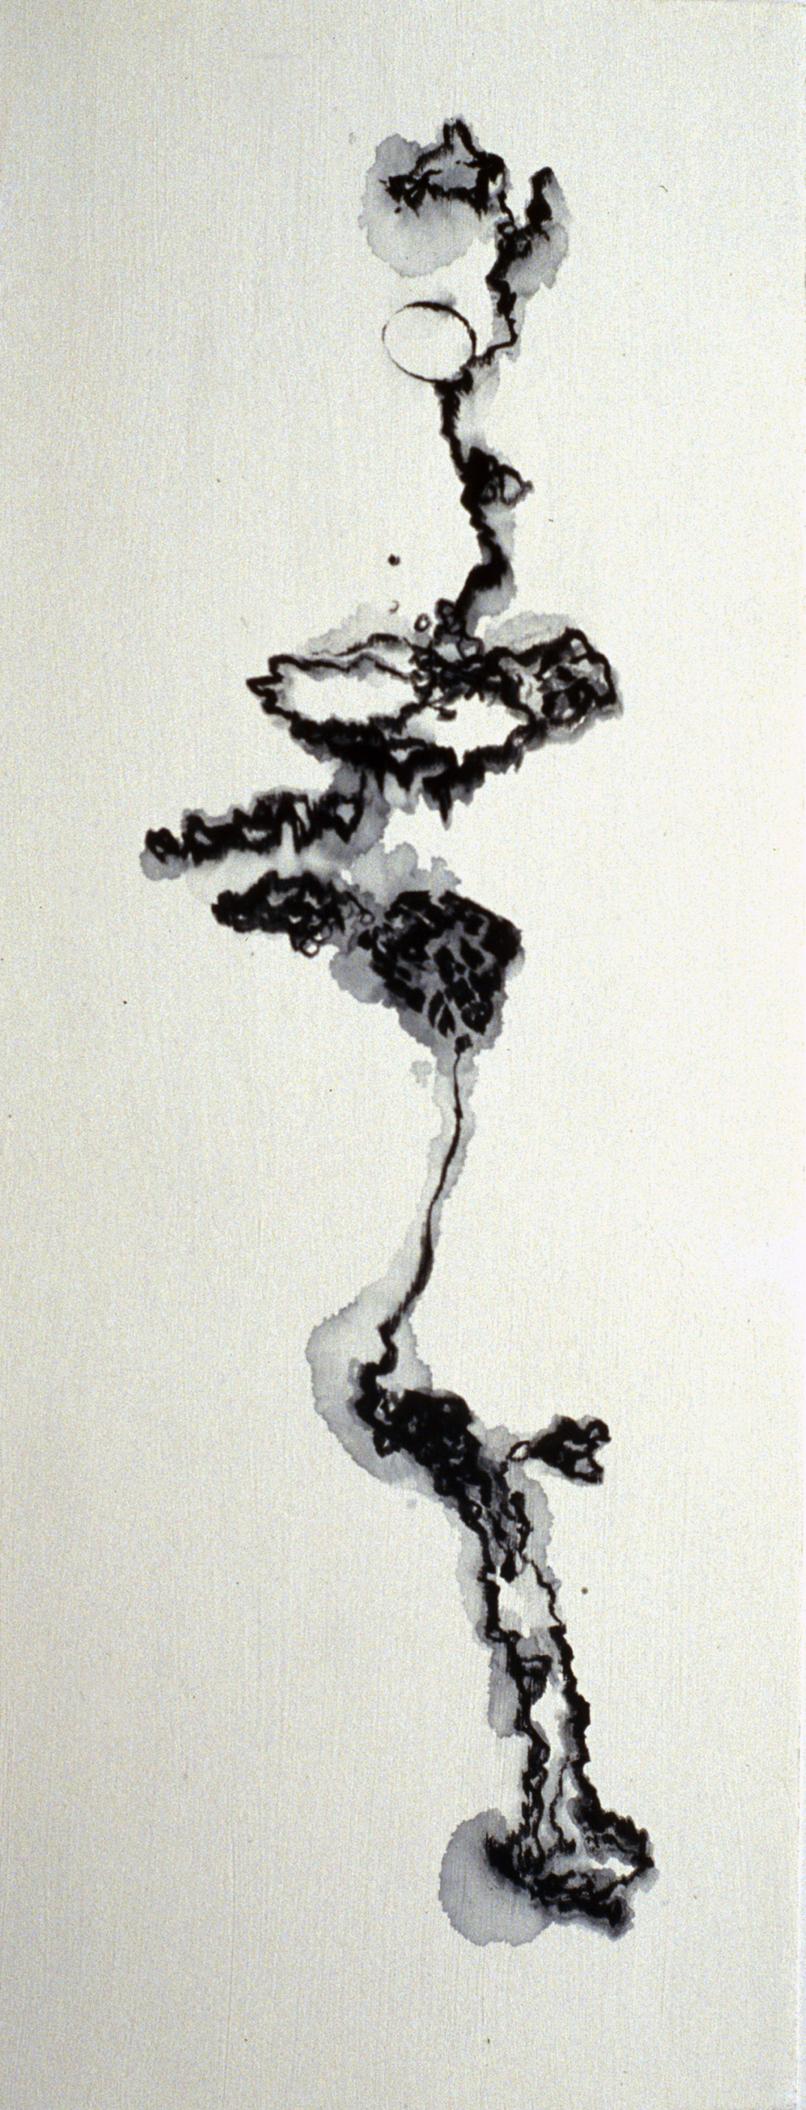 Hilda Shen, One-line Landscape II, 2000. Pencil on paper, 16 ½ x 6 ¾ inches, ©Hilda Shen, courtesy of Fou Gallery